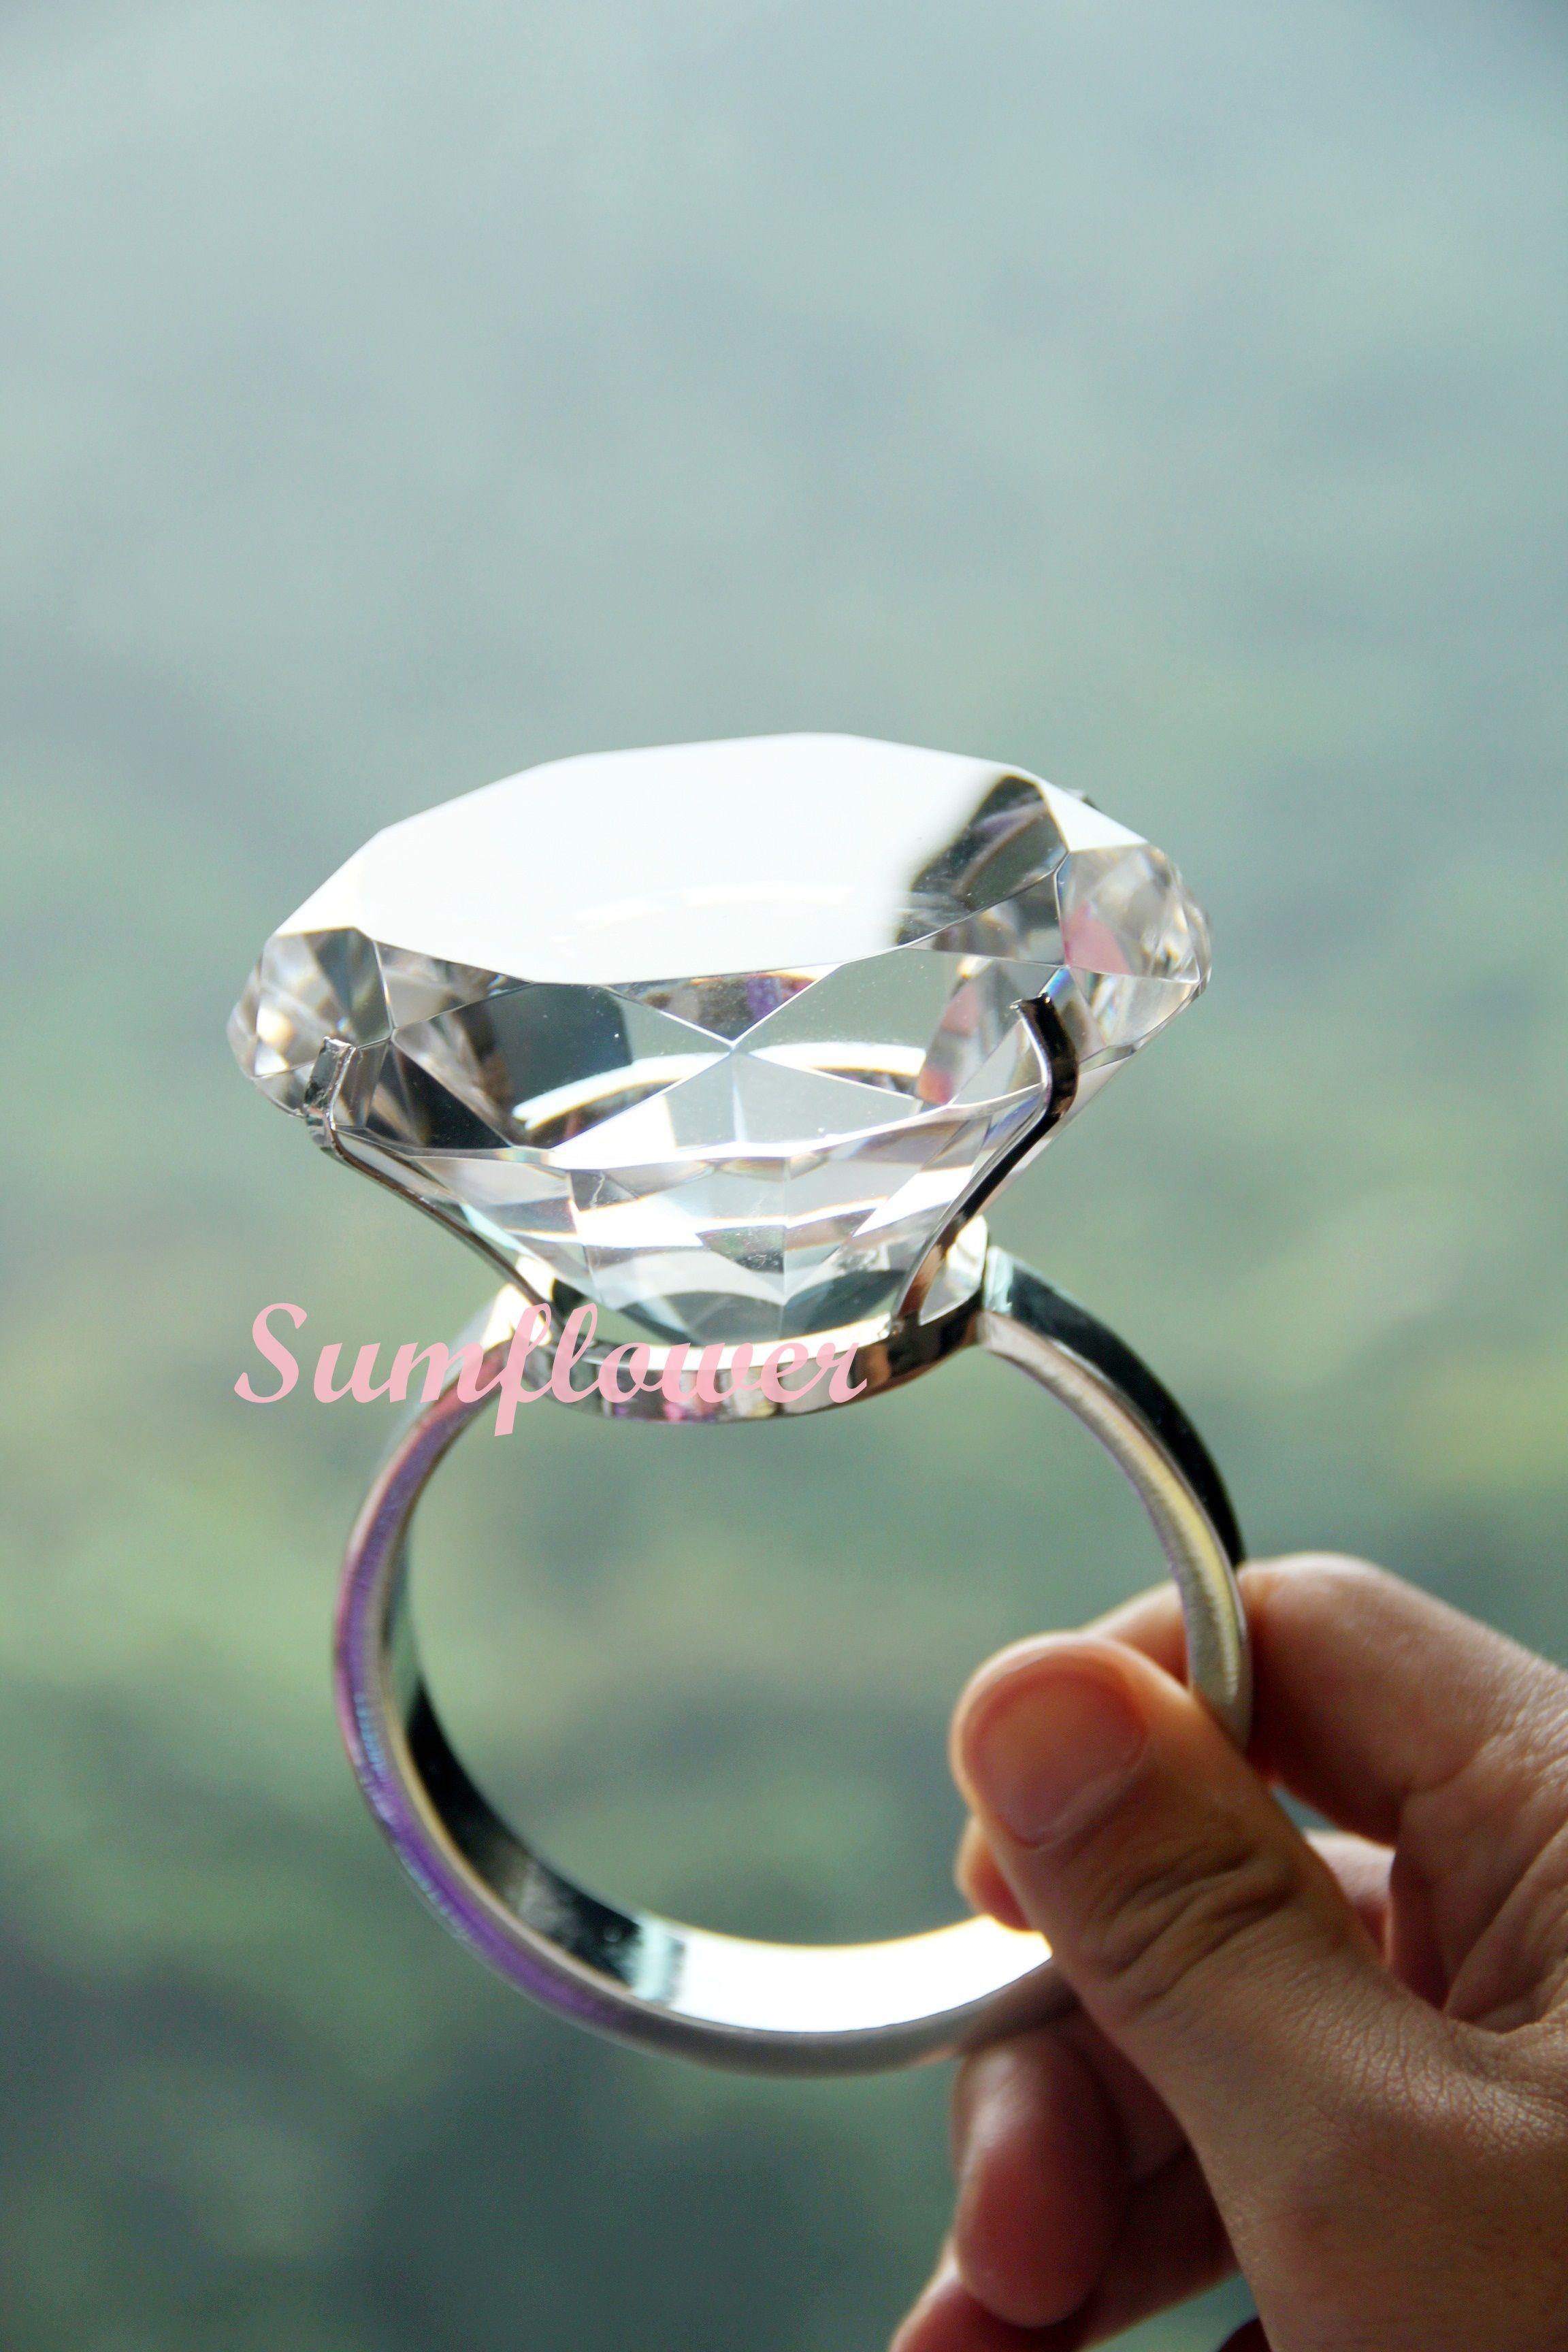 Big Plastic Diamond Ring Diamond Diameter : 8 Cm 超大粒仿鑽石戒指 仿鑽石